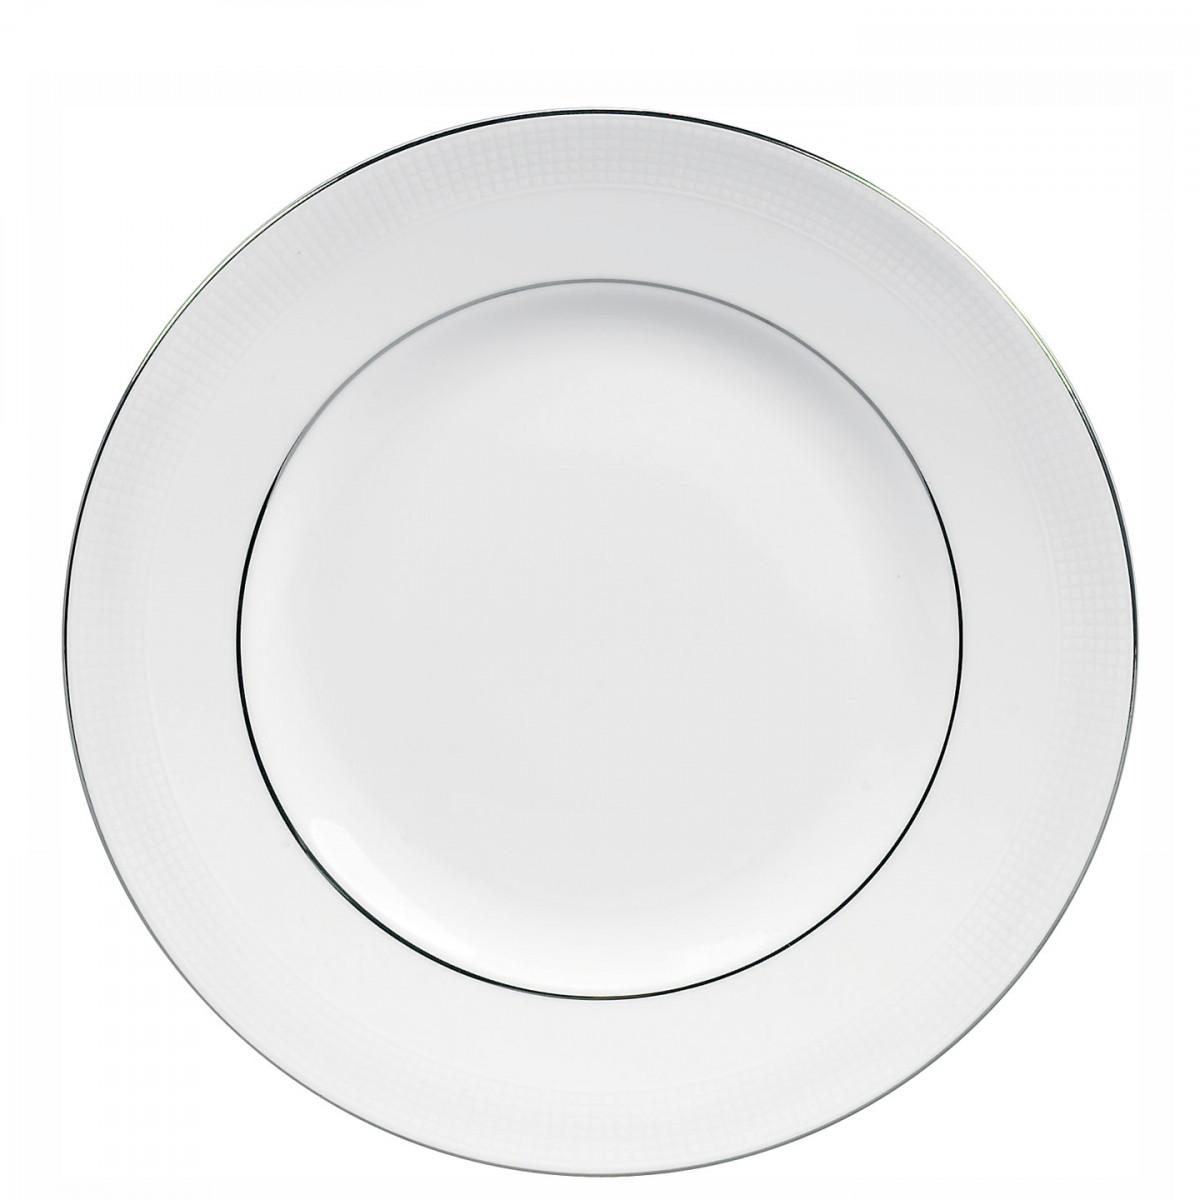 vera-wang-blanc-sur-blanc-plate-032677682098_2